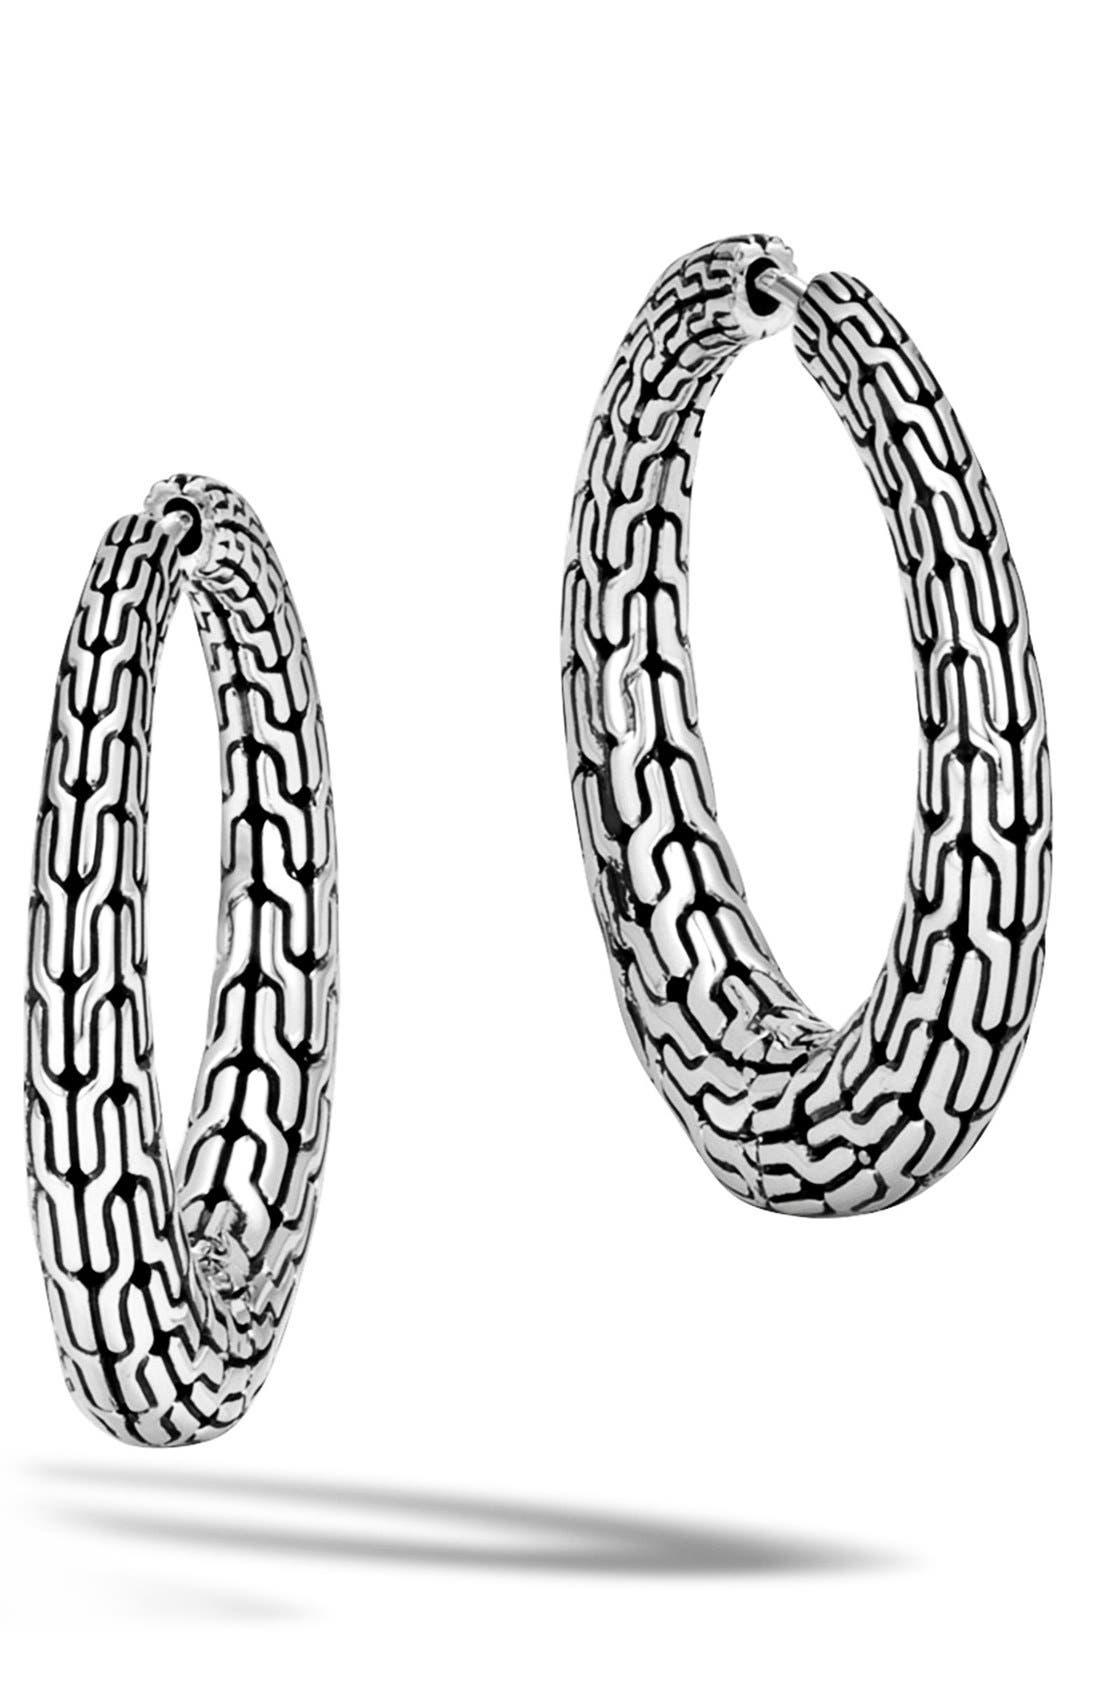 John Hardy Classic Chain Small Hinge Hoop Earrings